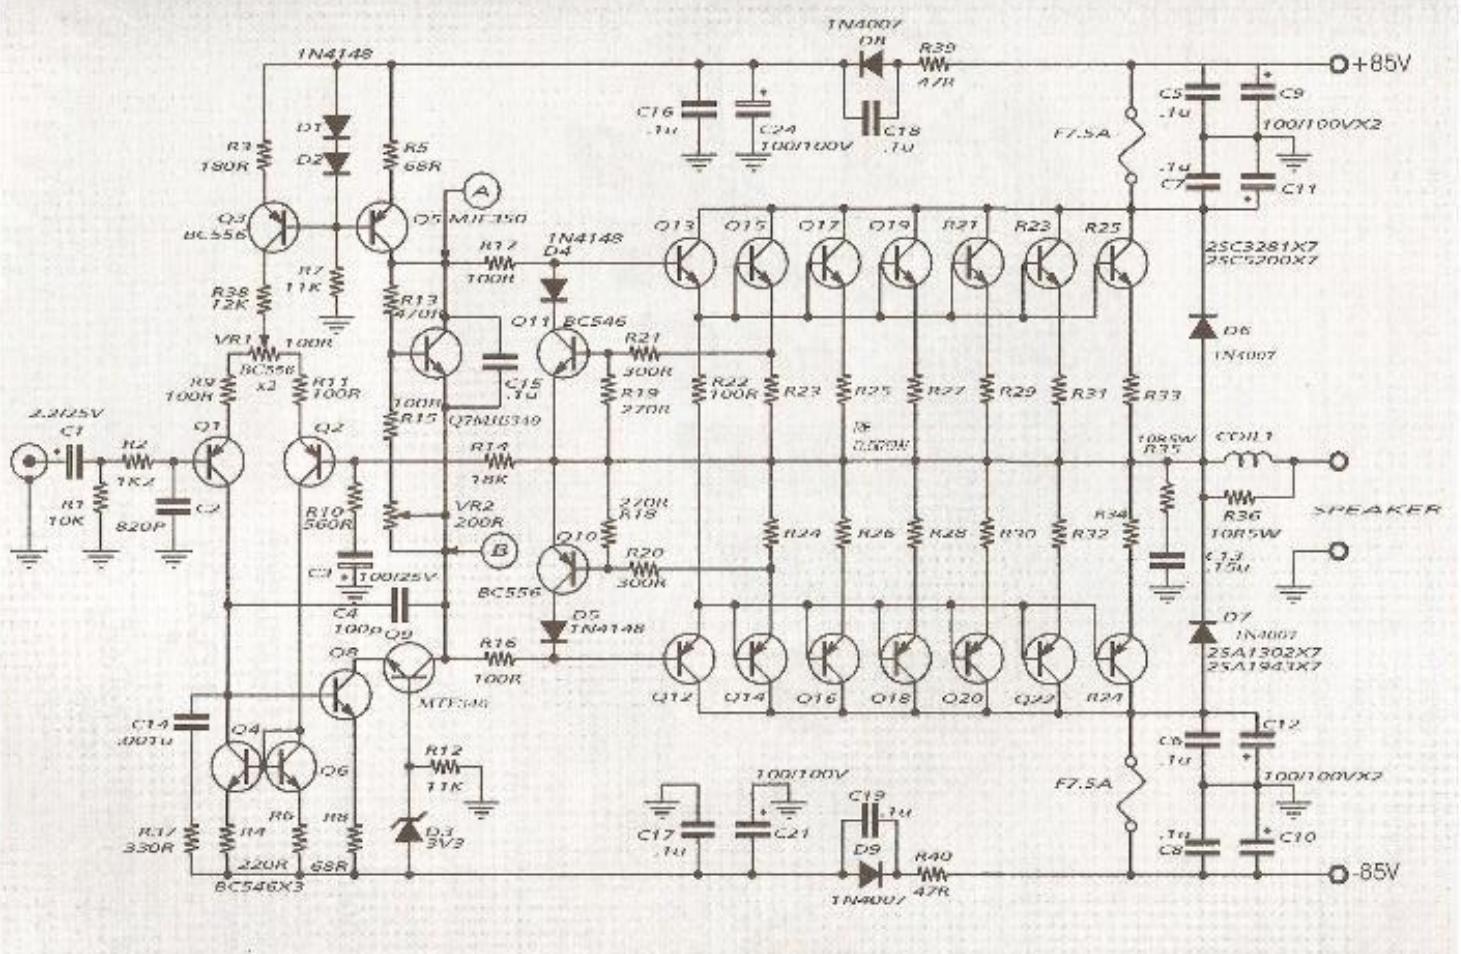 yamaha amp schematic wiring diagram list mix yamaha amp schematic advance wiring diagram yamaha jx20 amp [ 1461 x 954 Pixel ]